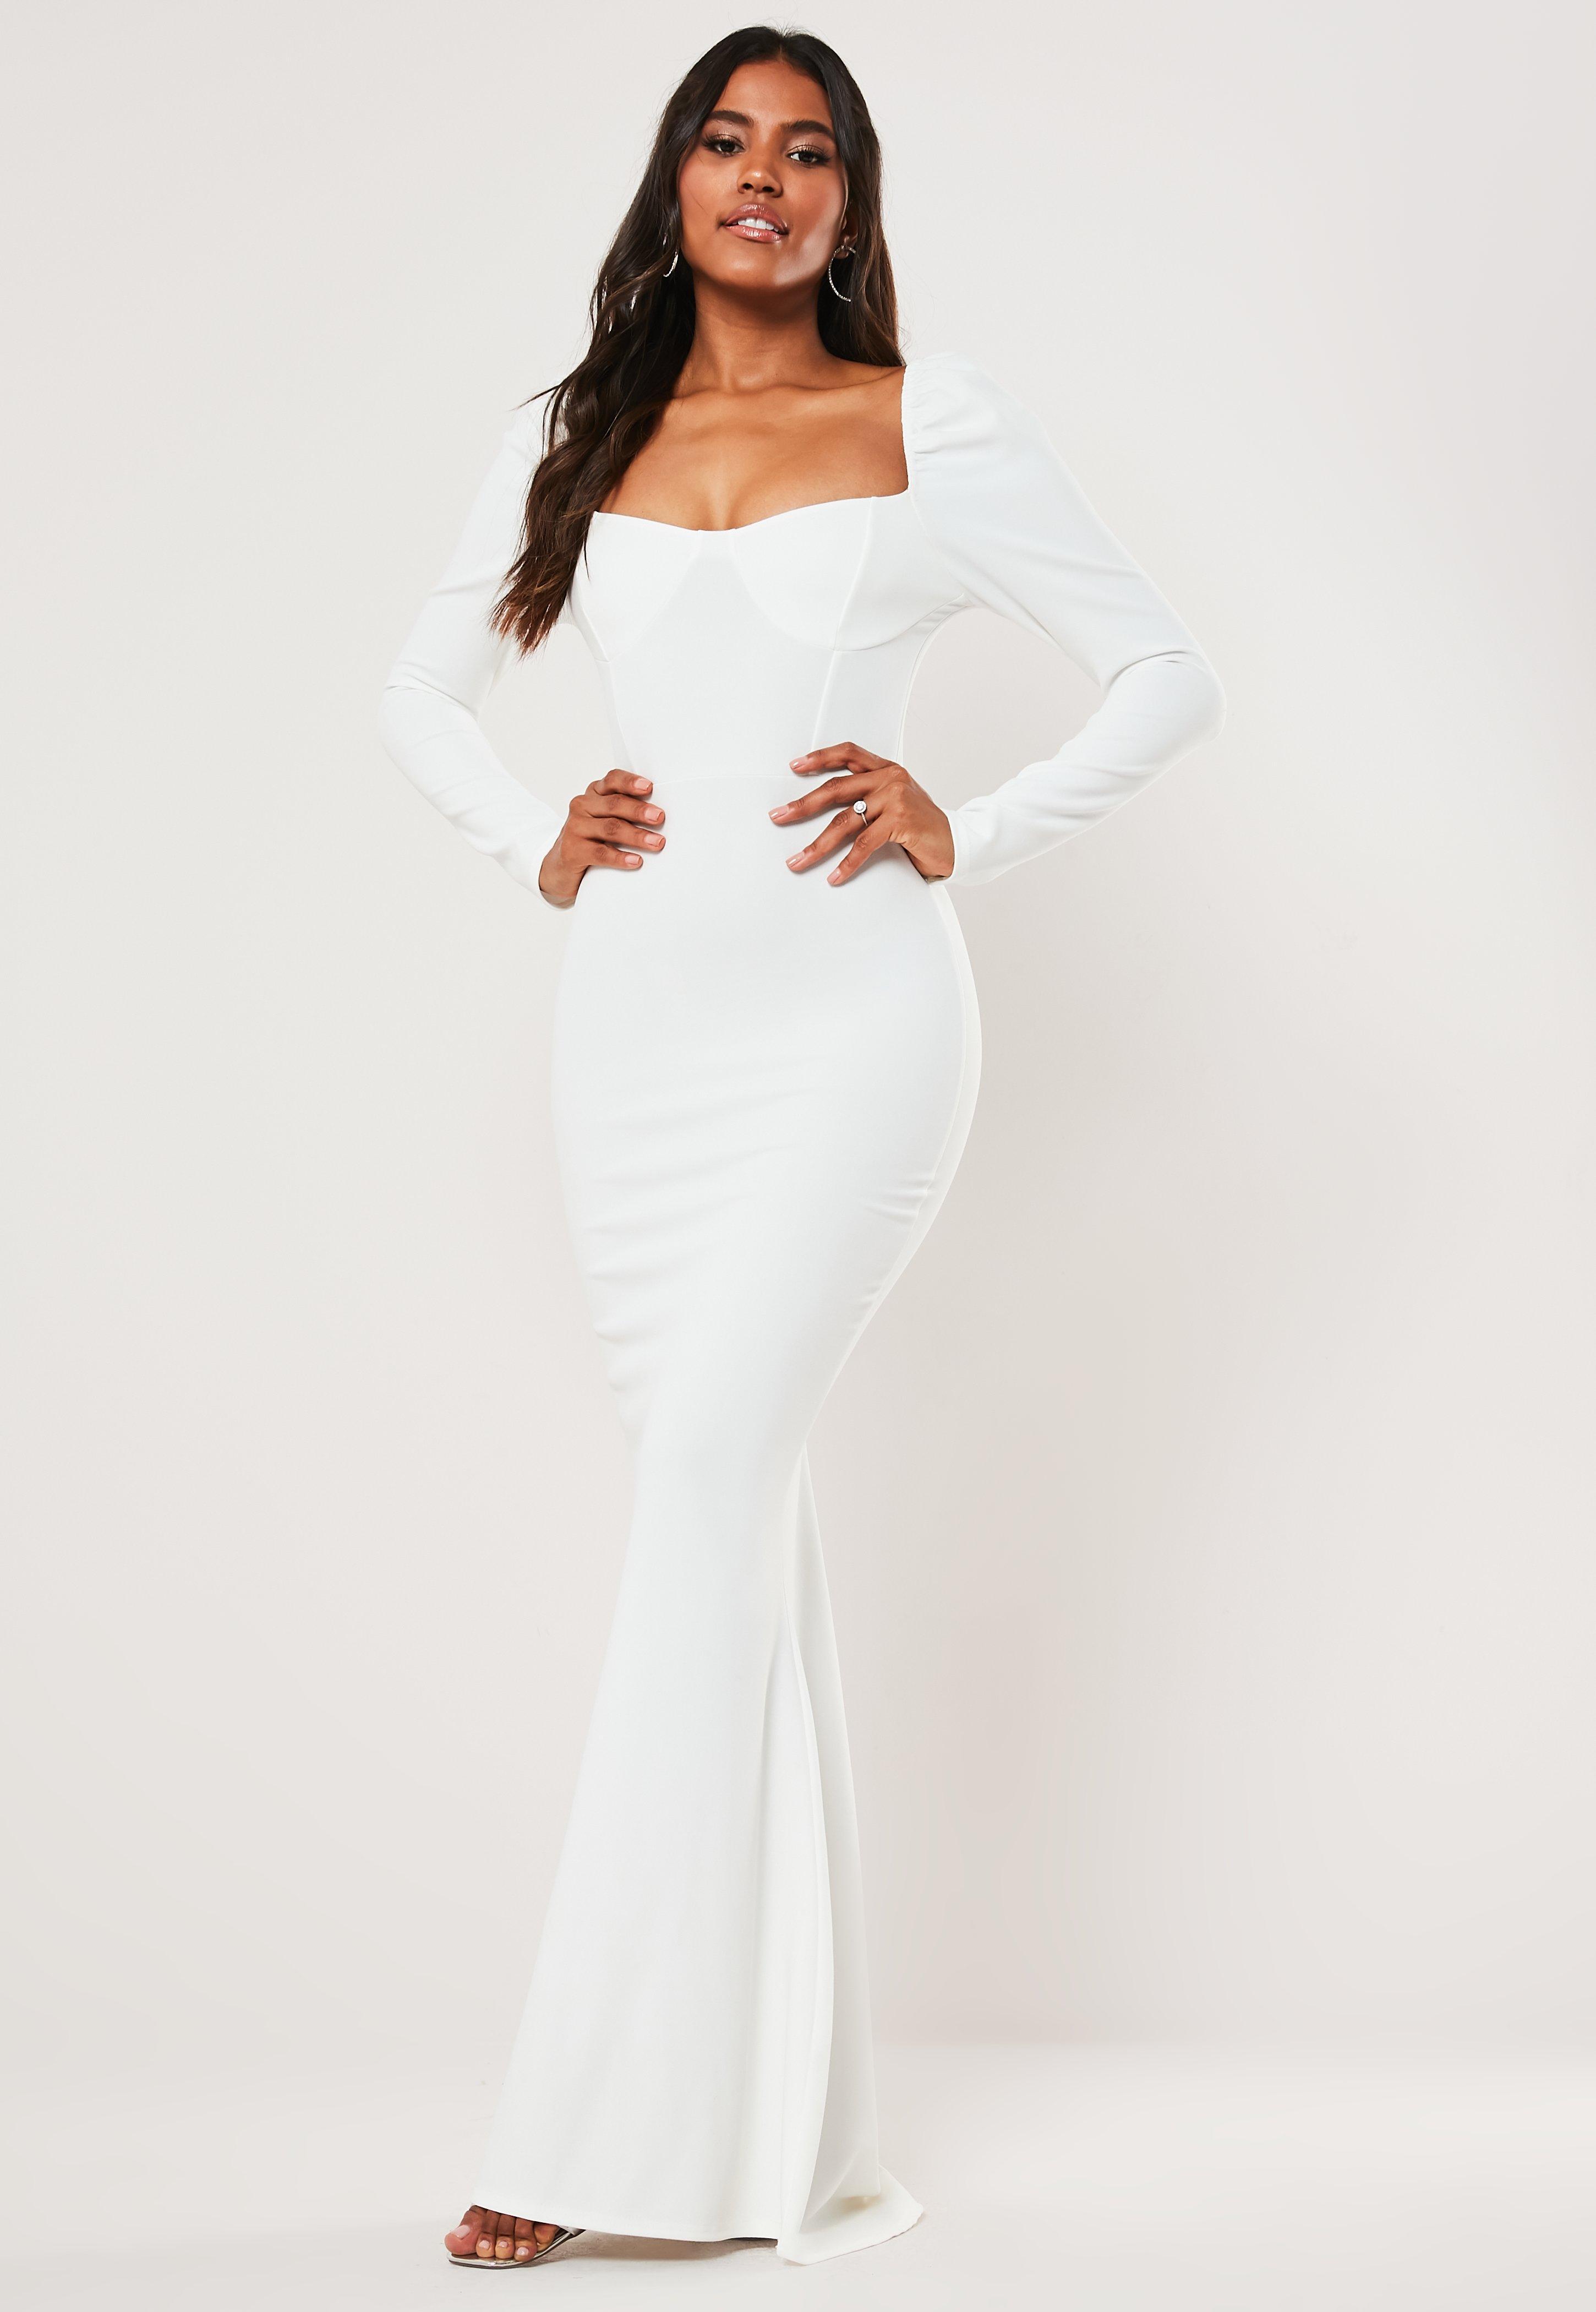 Vestido largo de manga larga con escote mesonera con cola en blanco